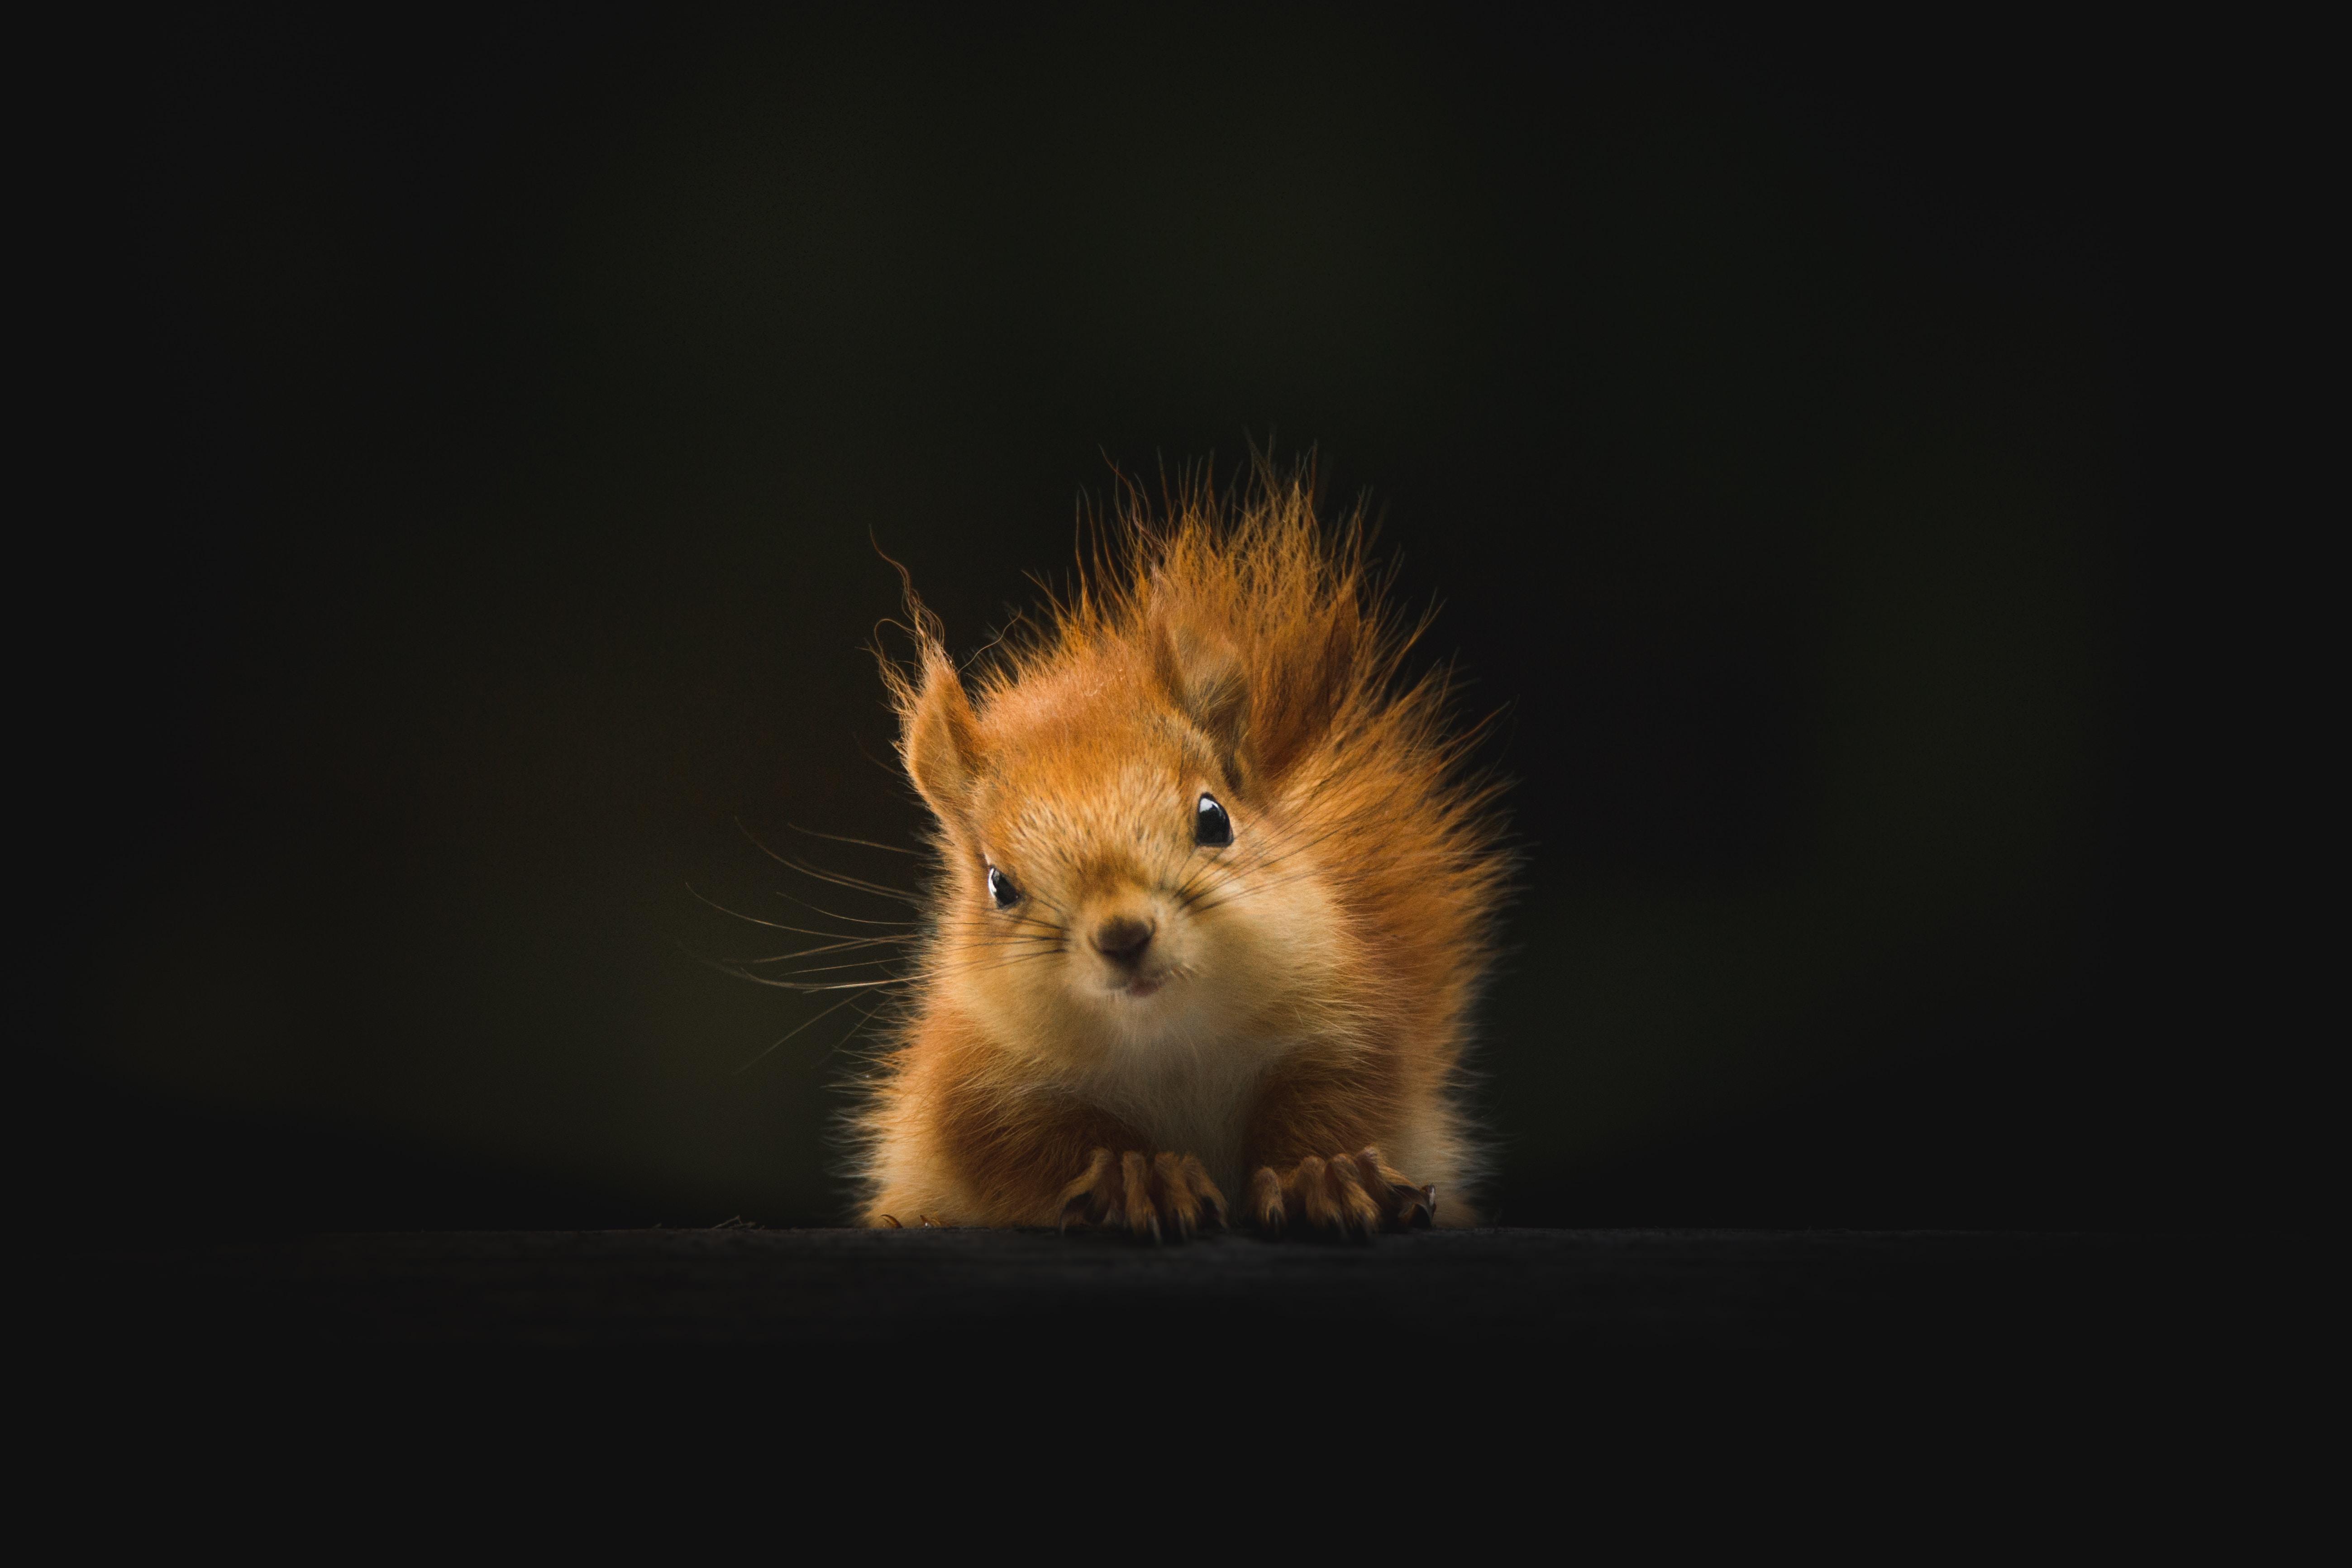 Kawaii Fall Wallpaper The Staring Squirrel Photo By Geran De Klerk Geran On